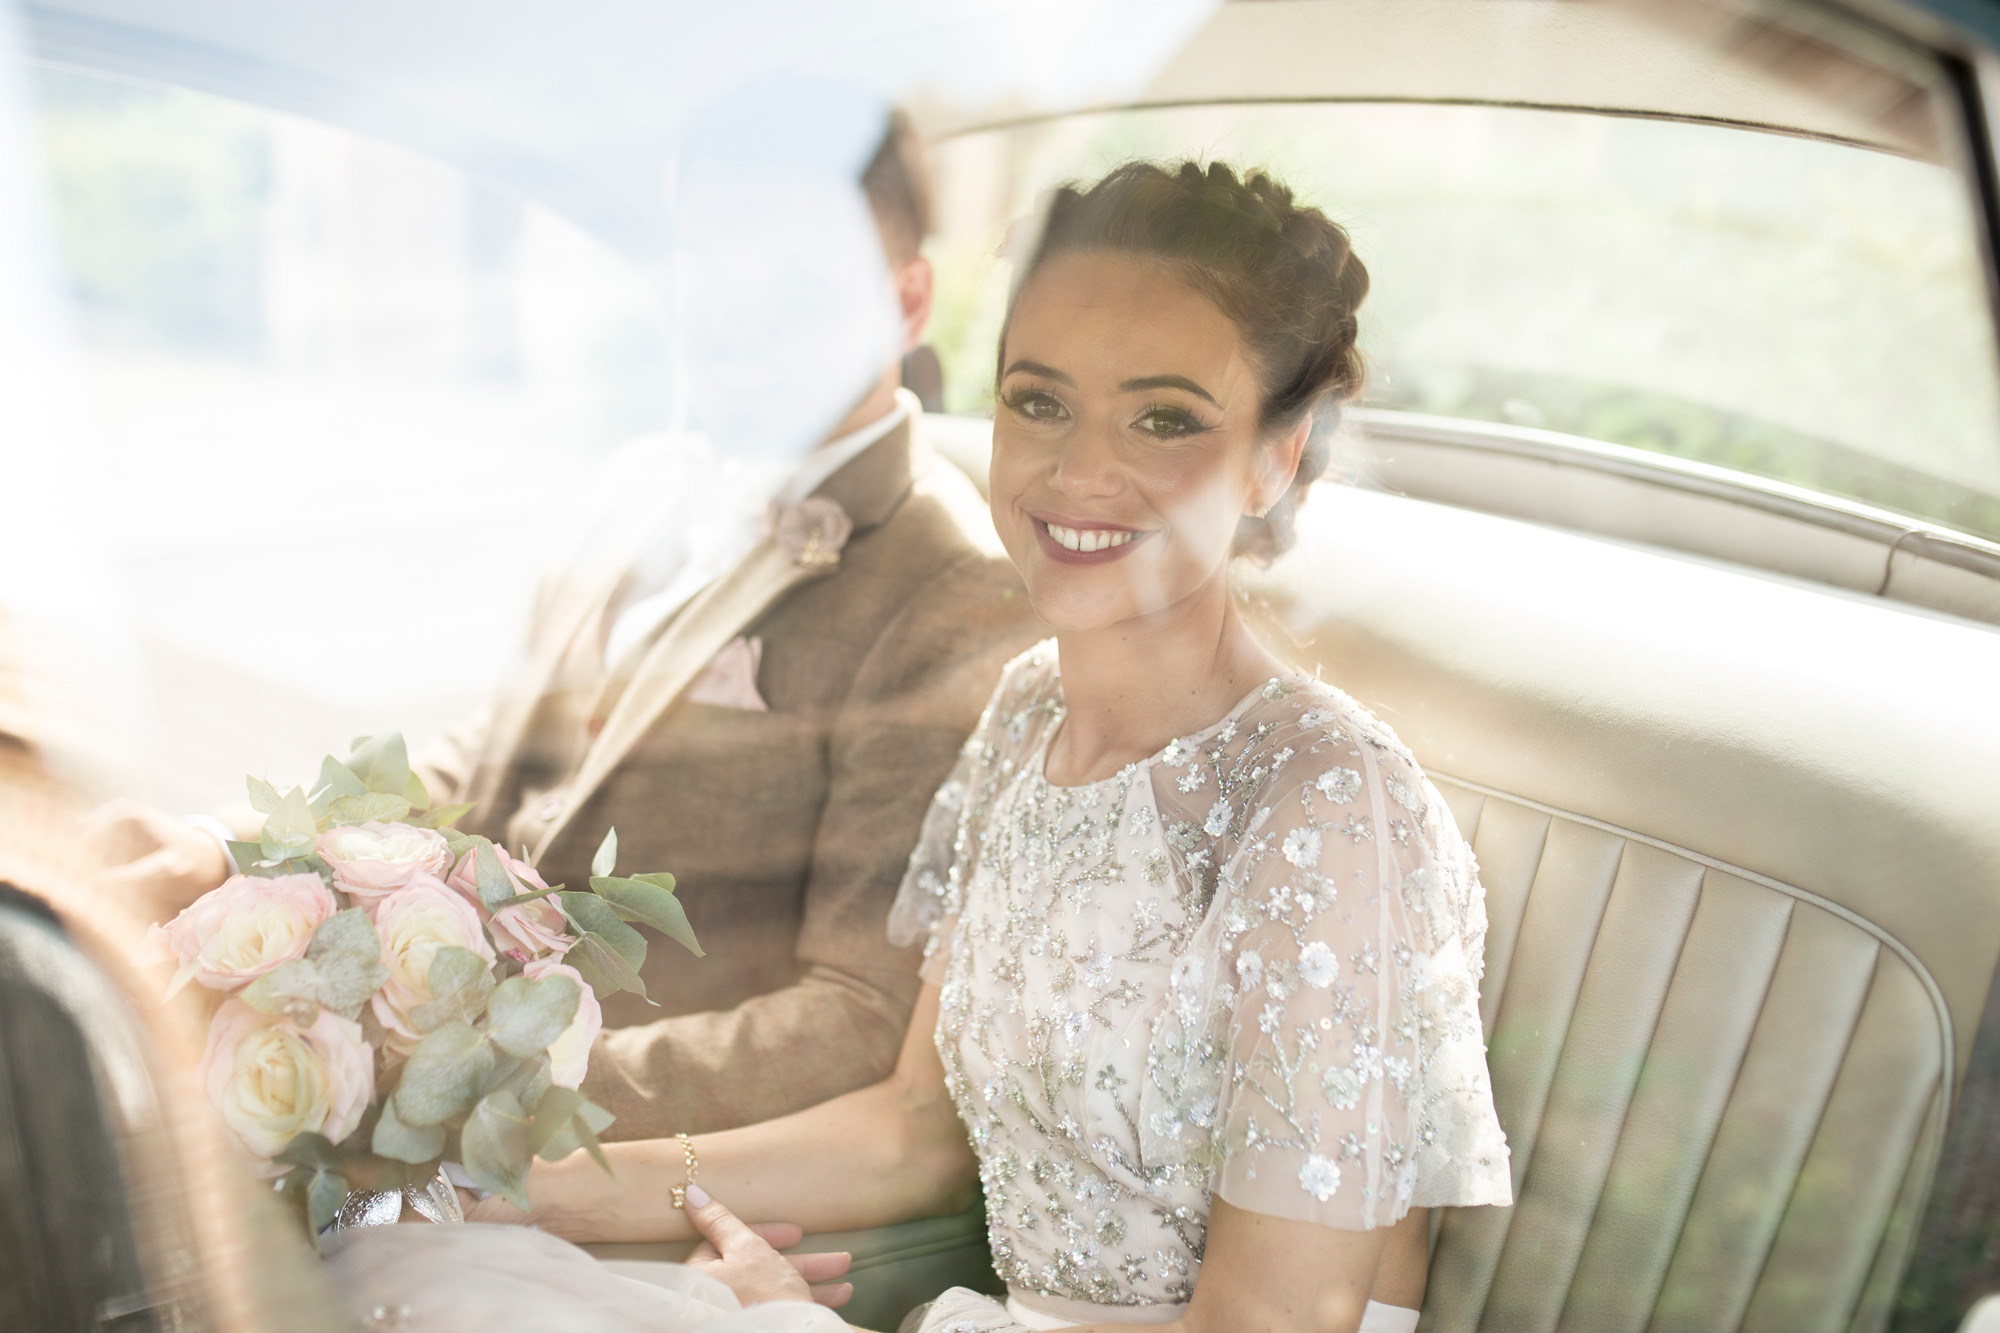 bride photo in wedding car.jpg